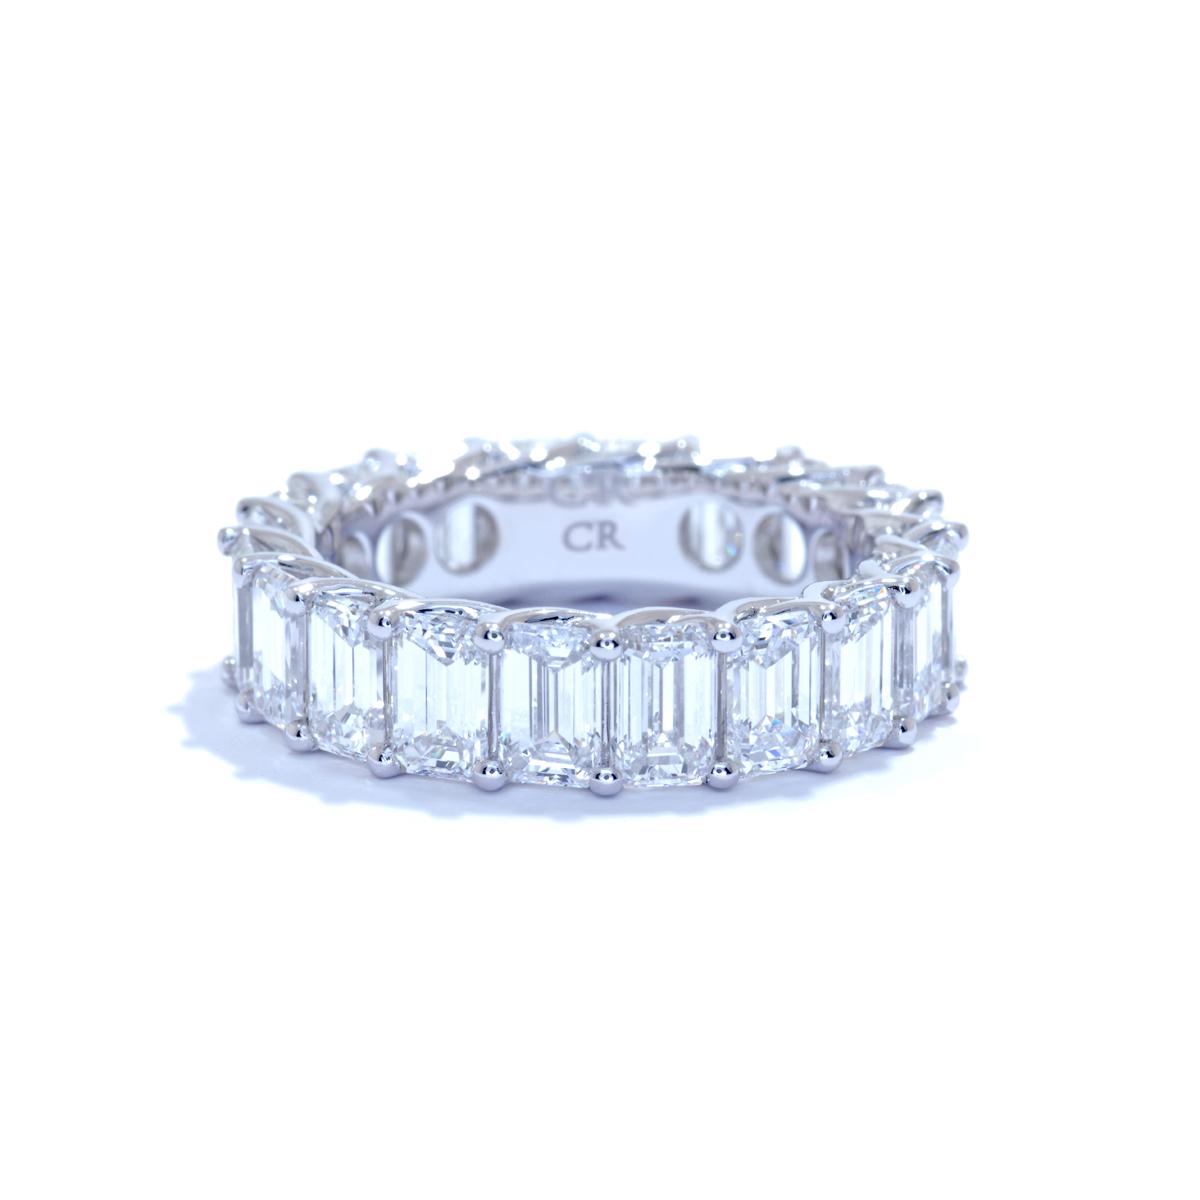 Wedding Bands – Ascot Diamonds Regarding 2019 Certified Diamond Anniversary Bands In Rose Gold (View 18 of 25)